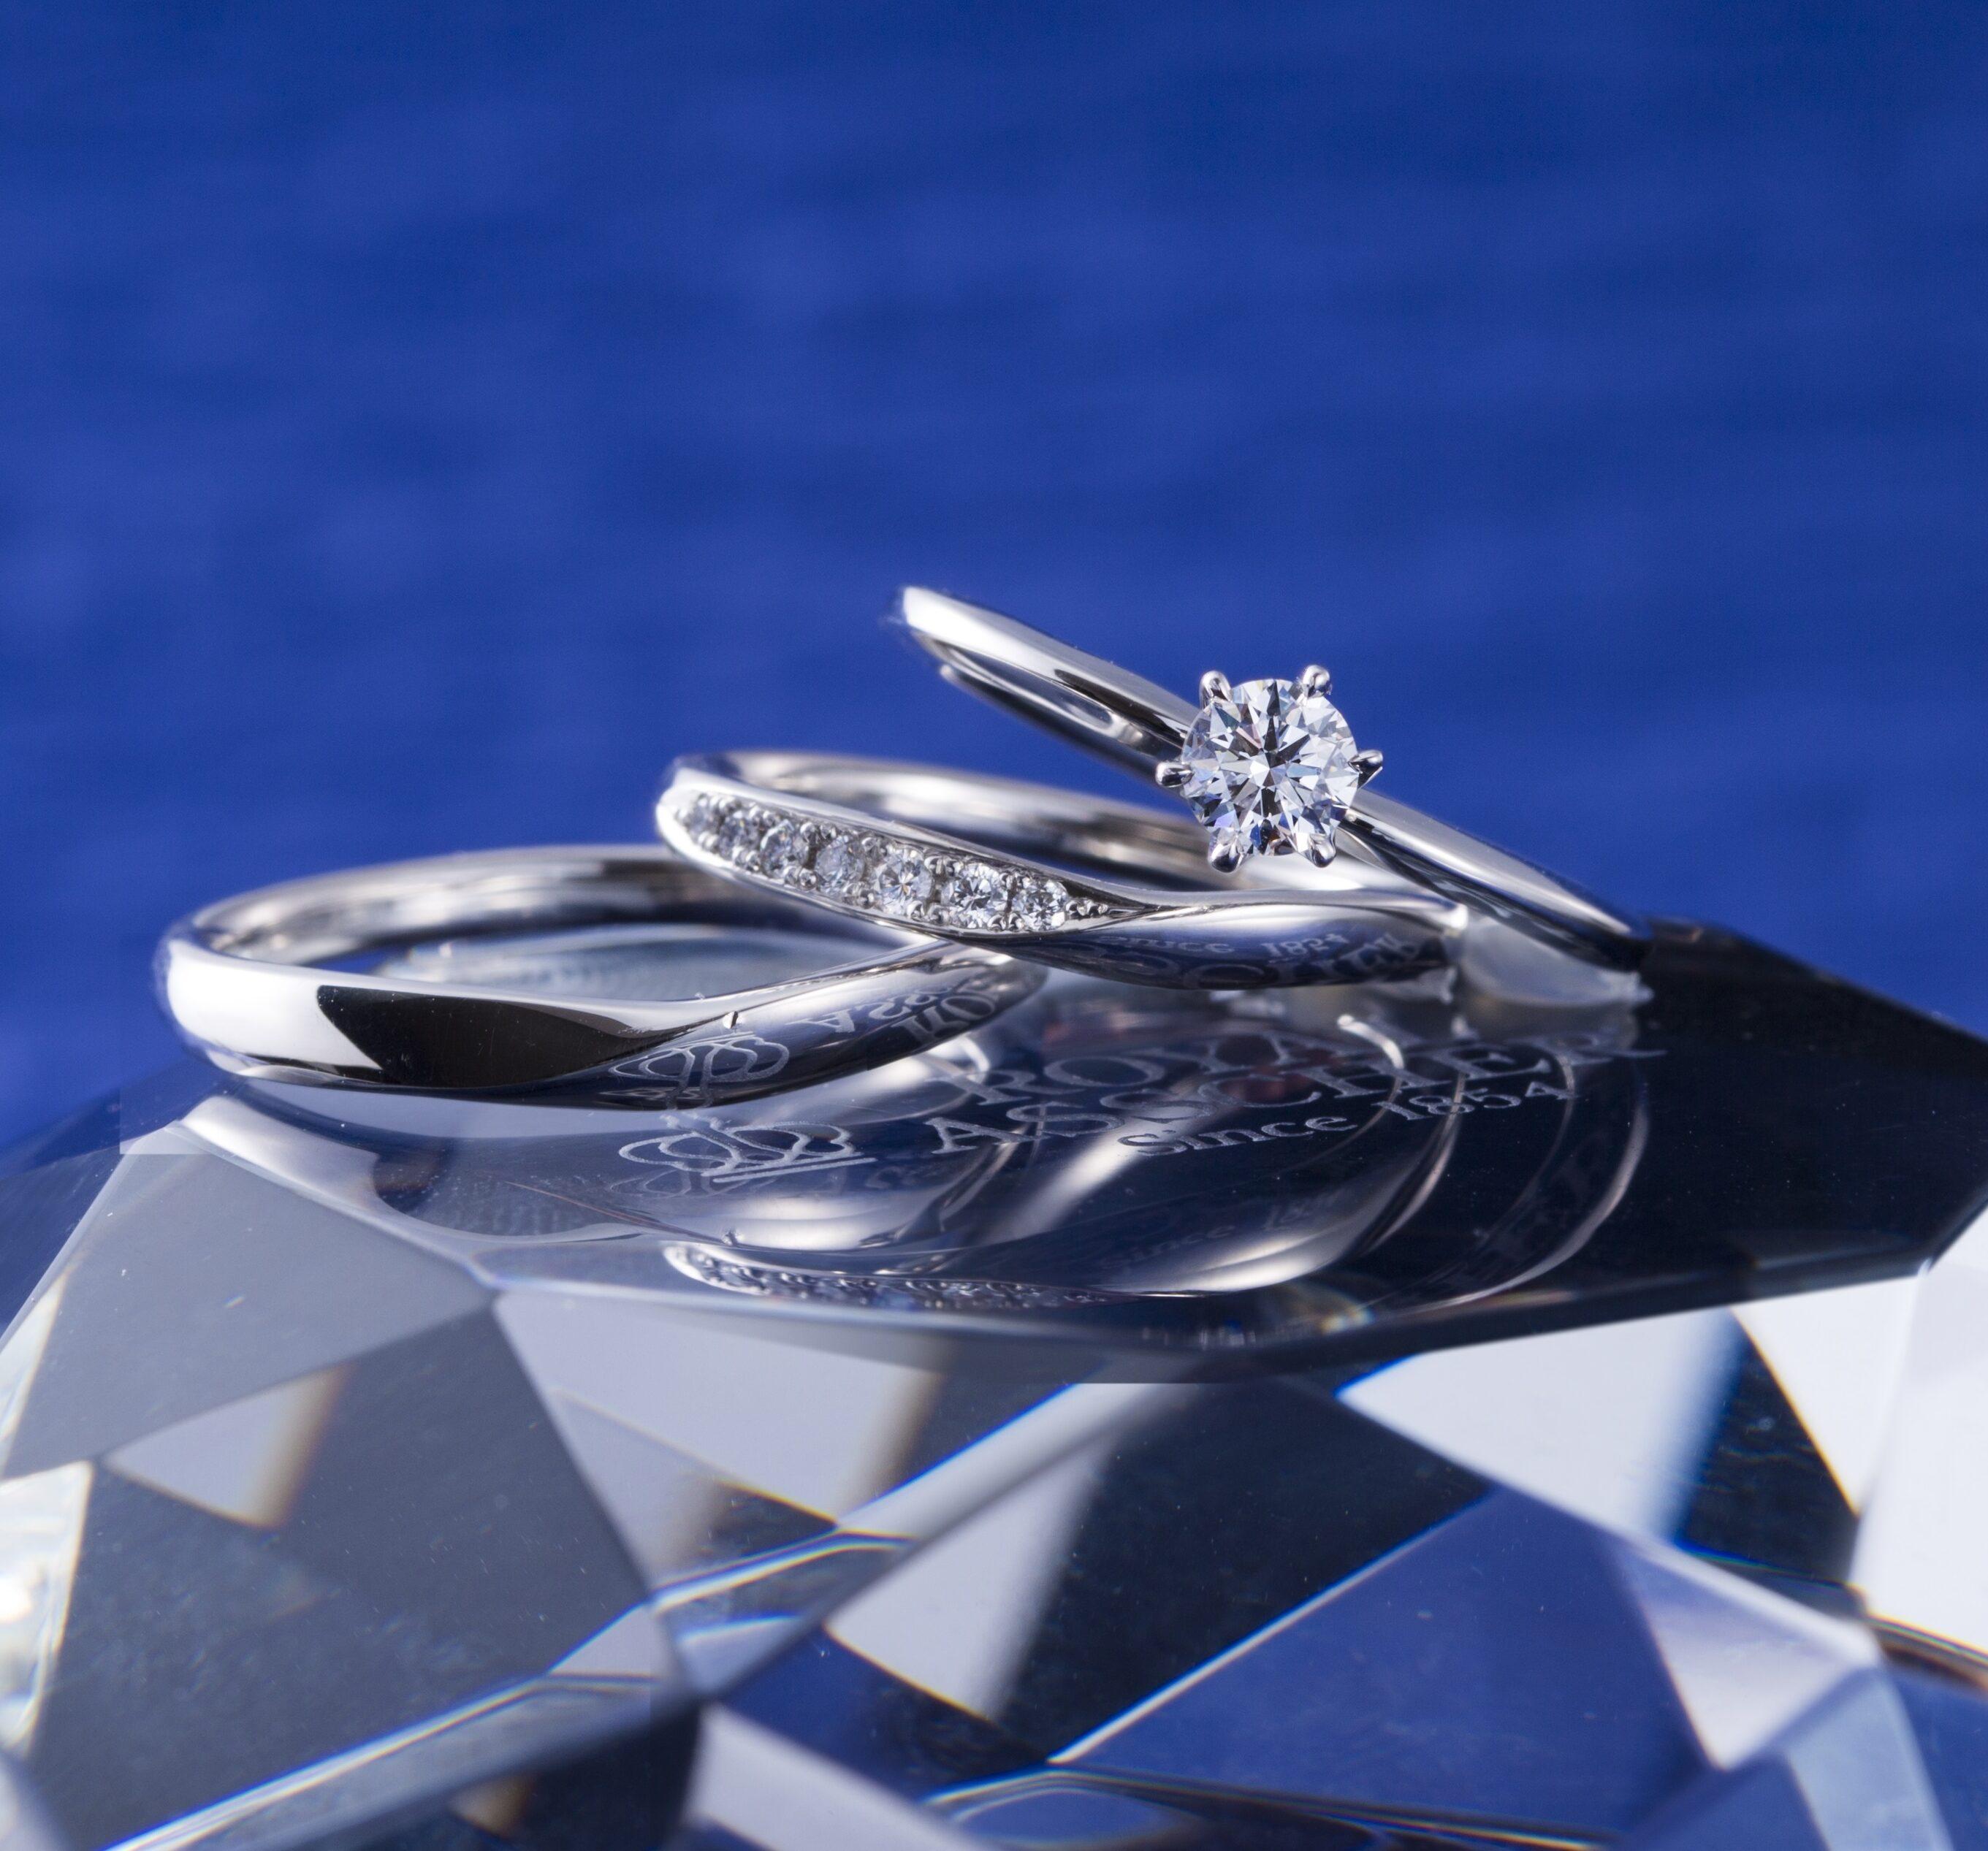 ERA809 WRA059 WRB069|ロイヤルアッシャー婚約指輪・結婚指輪